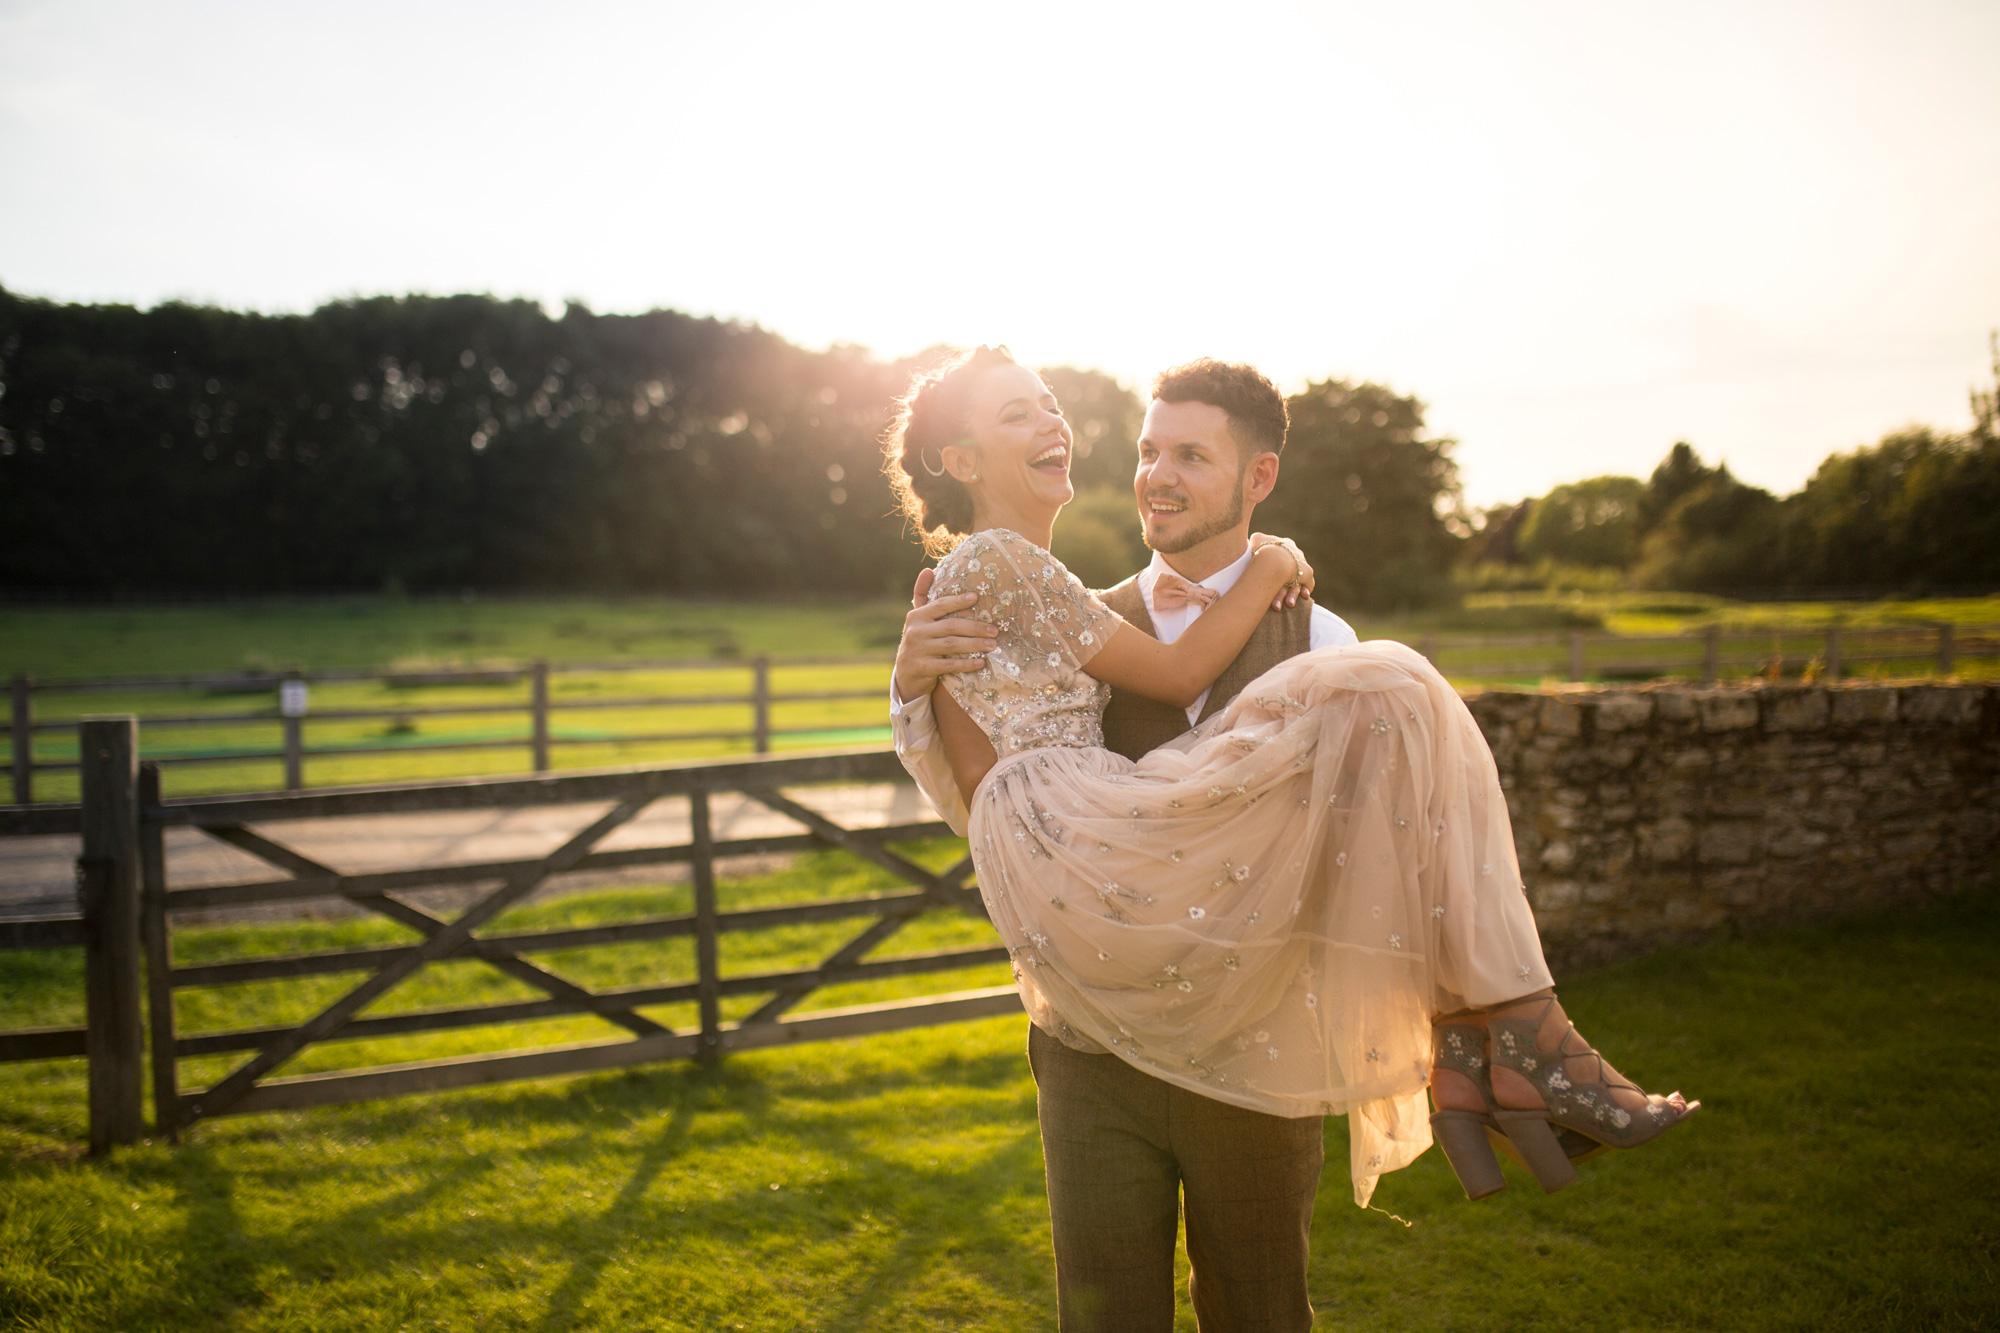 Sunset, Couple, Bride, Groom, Kissing Gate, Wedding Day, Buckinghamshire Wedding,